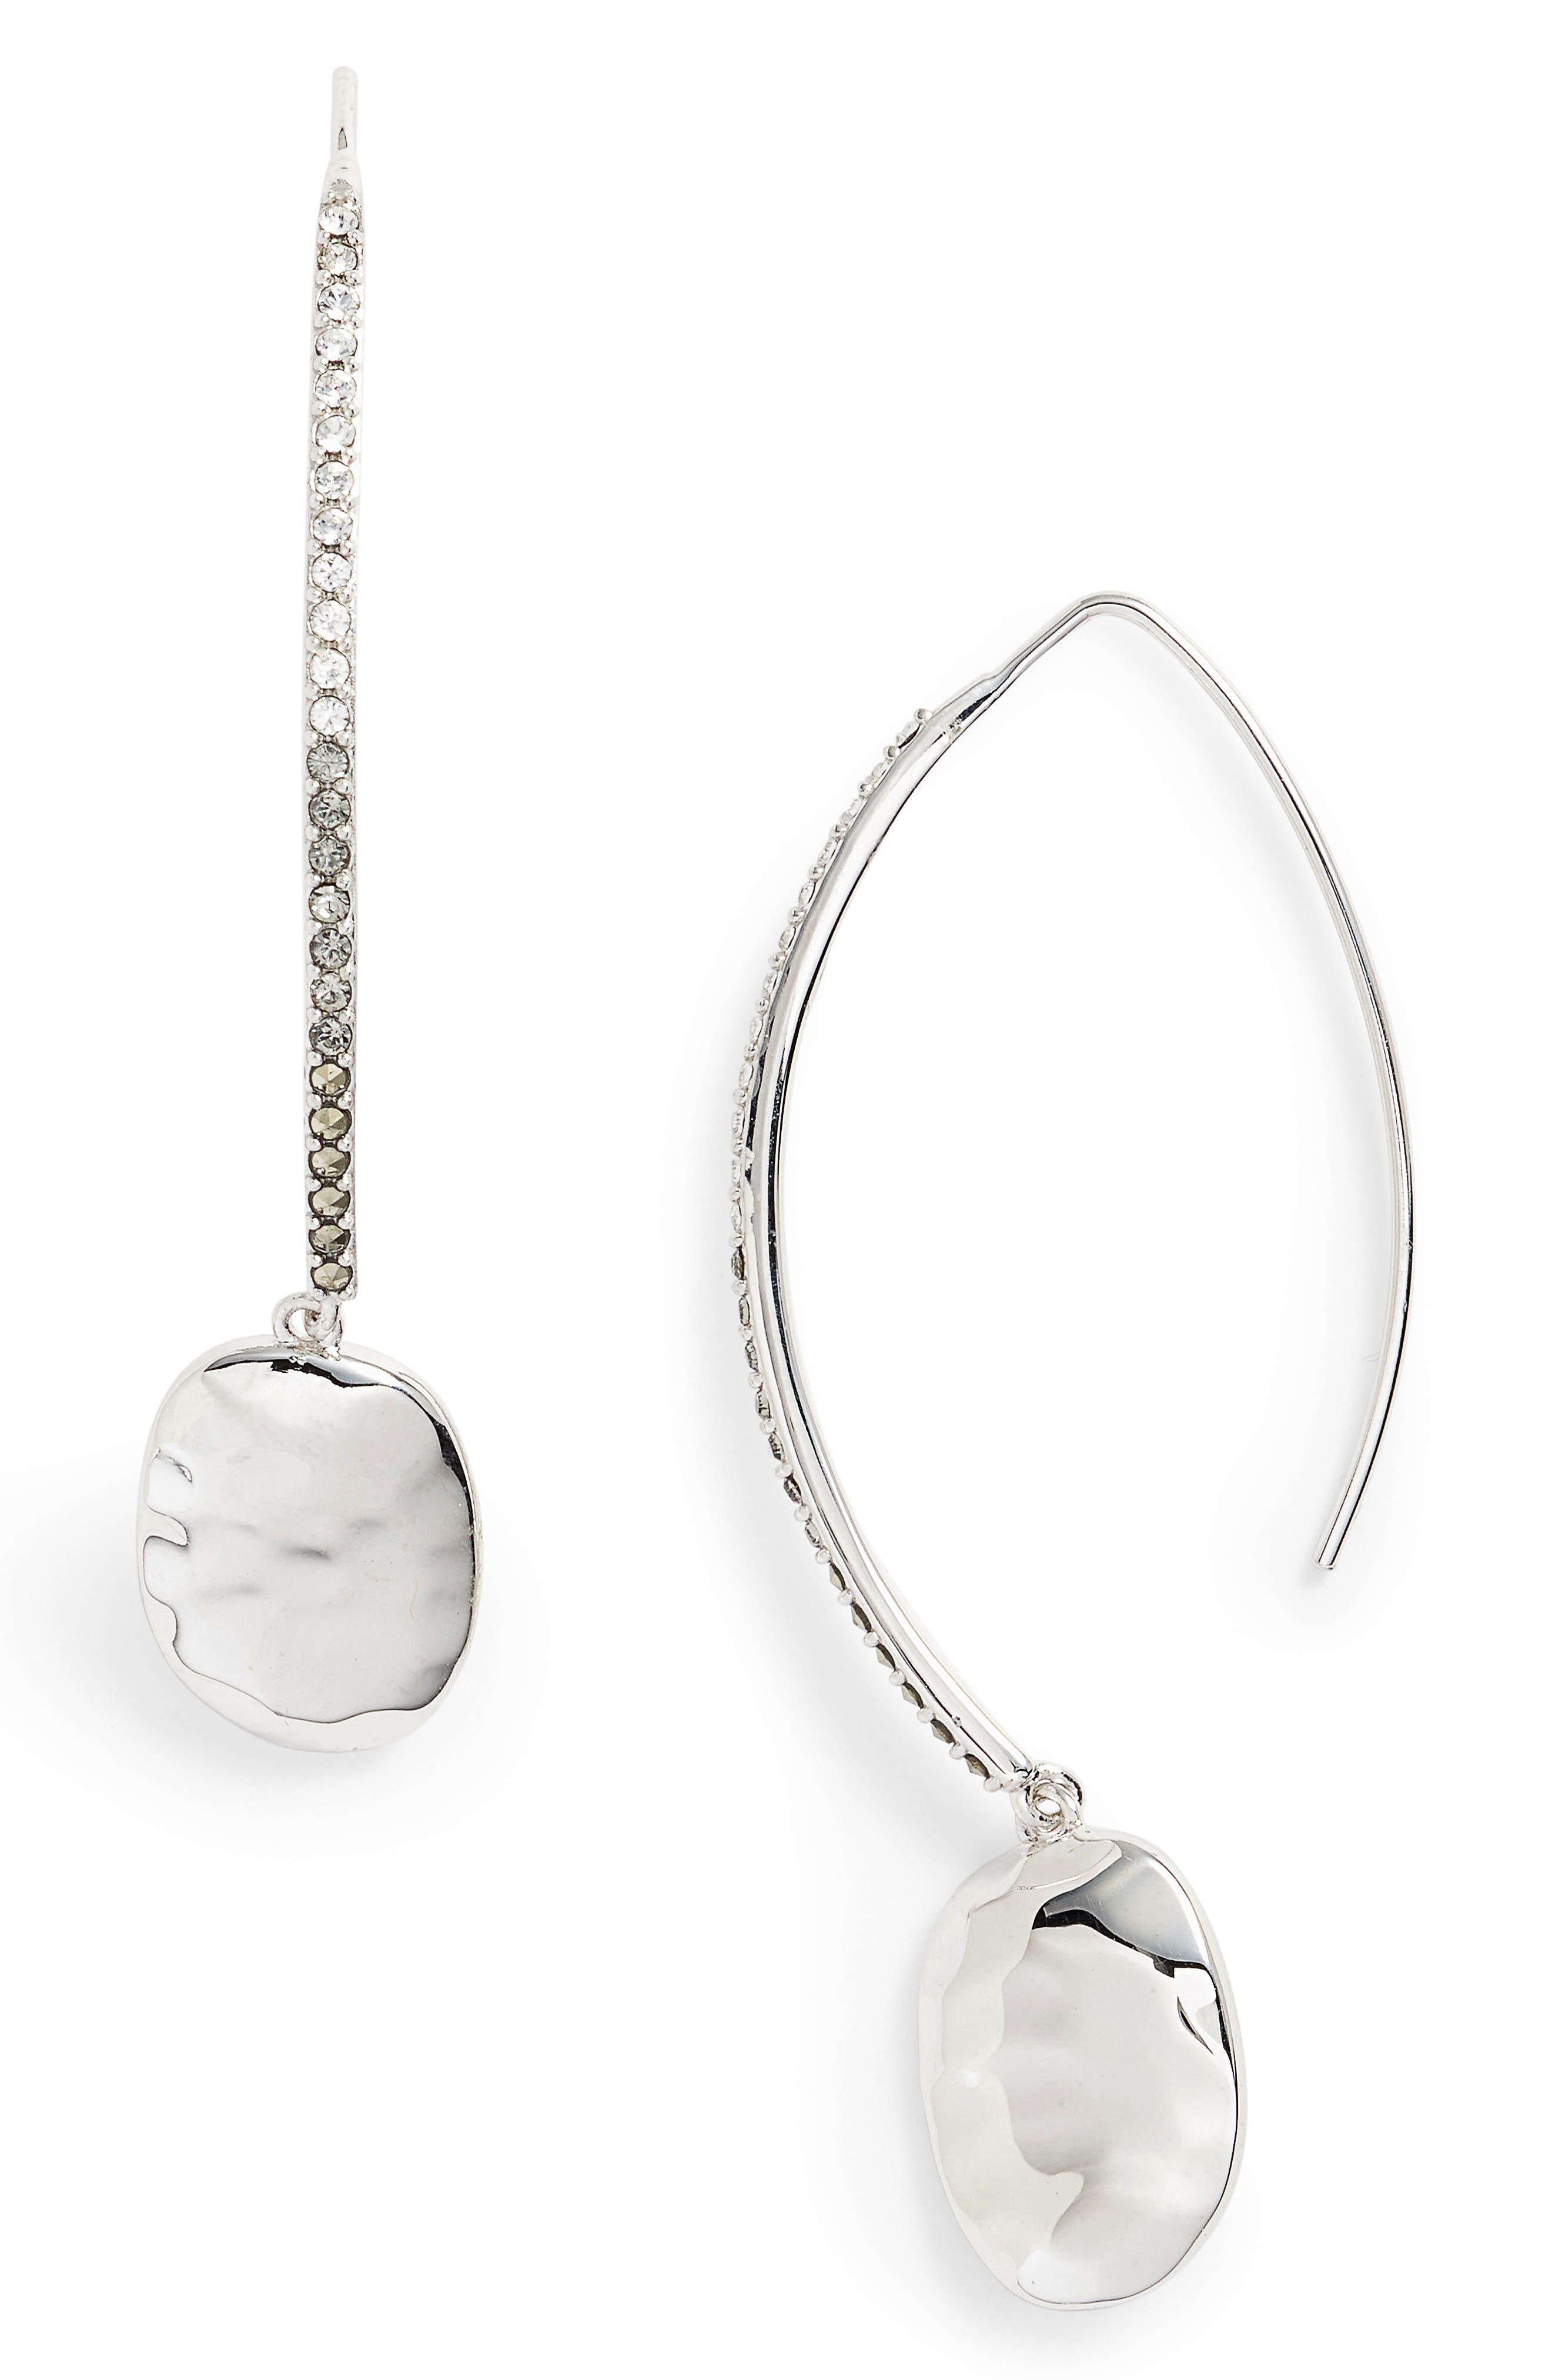 Threader Drop Earrings,                             Main thumbnail 1, color,                             Silver